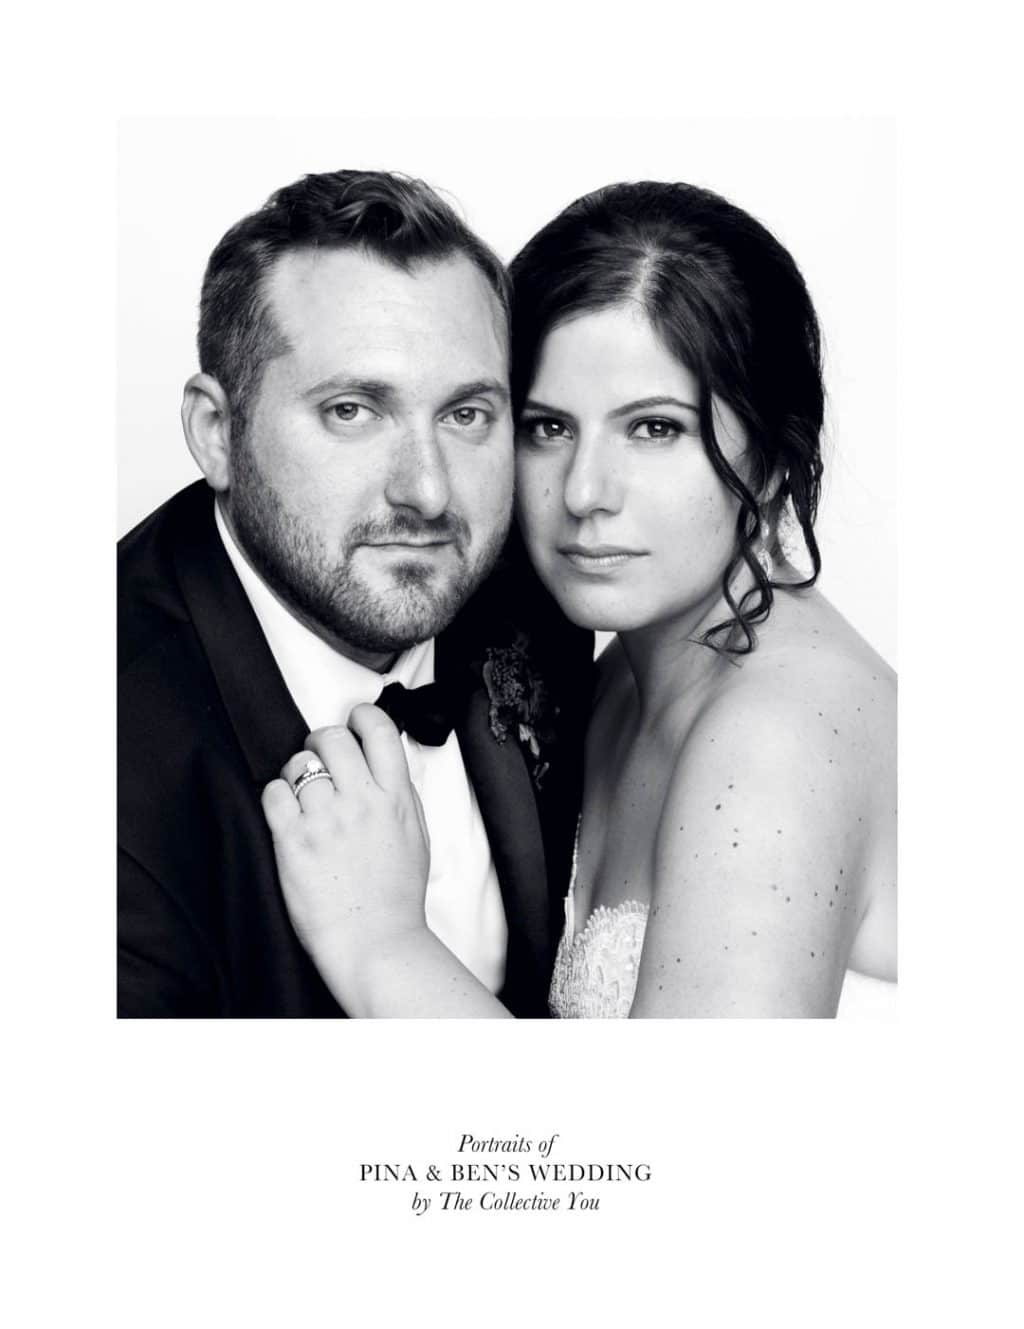 Black & White Portrait for wedding